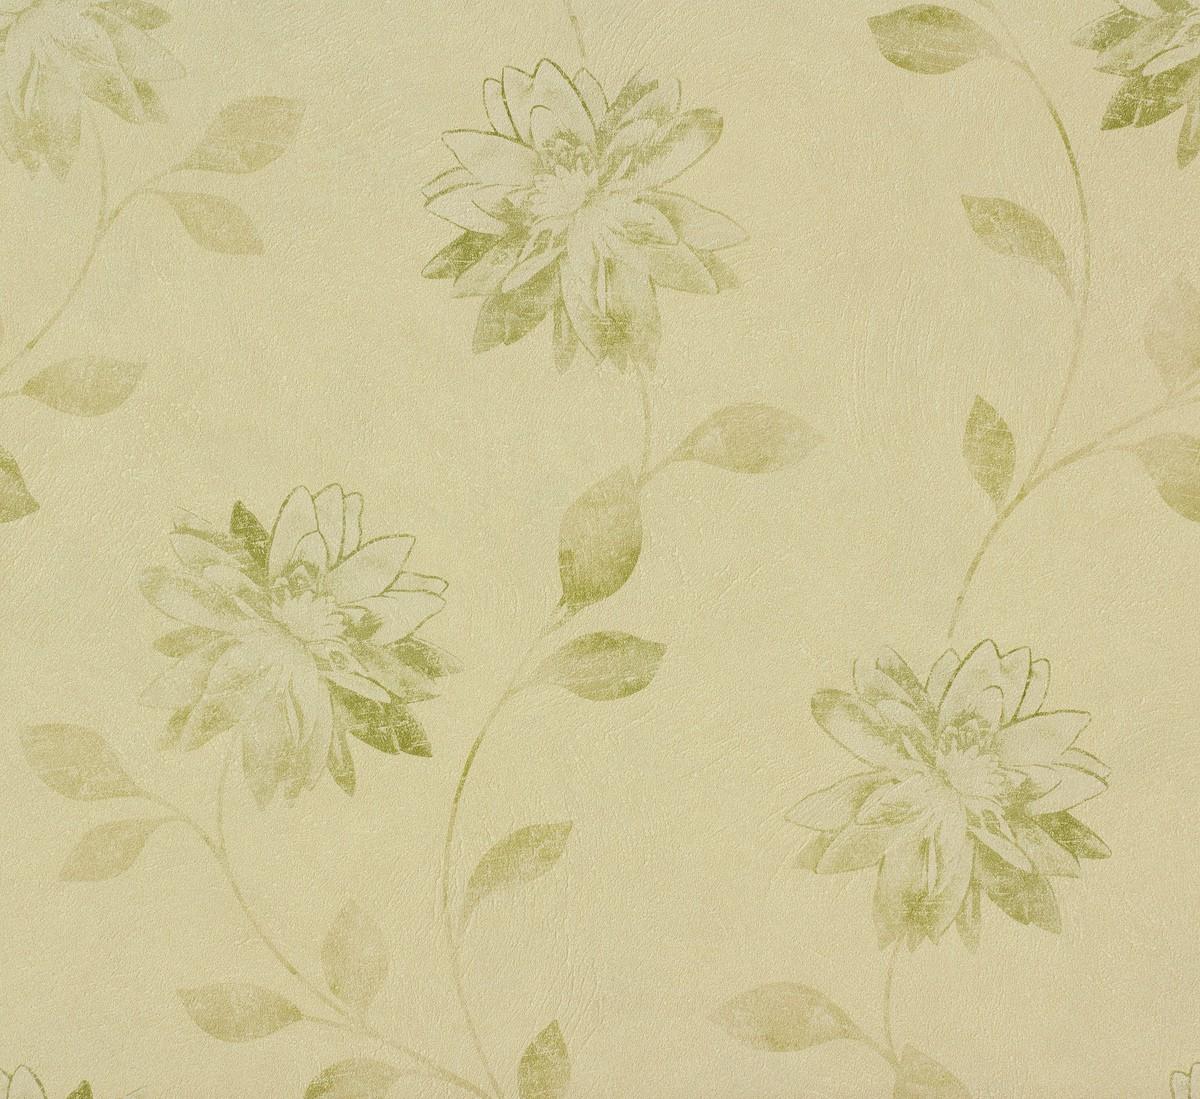 tapete rasch fiducia blumen beige gr n 425154. Black Bedroom Furniture Sets. Home Design Ideas